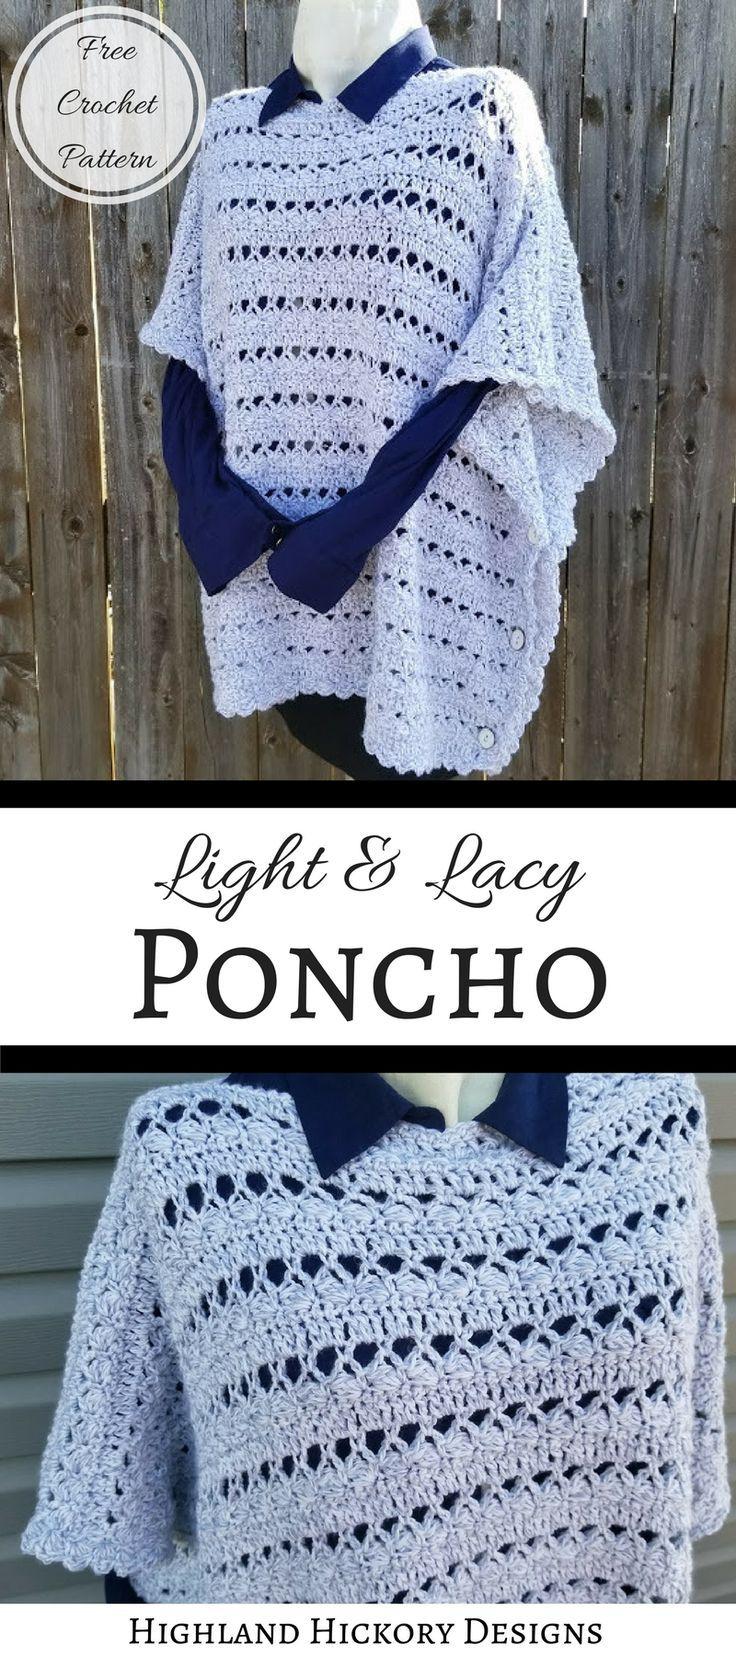 Seasonal Wardrobe: Crochet The Light & Lacy Poncho To Add To Your Seasonal